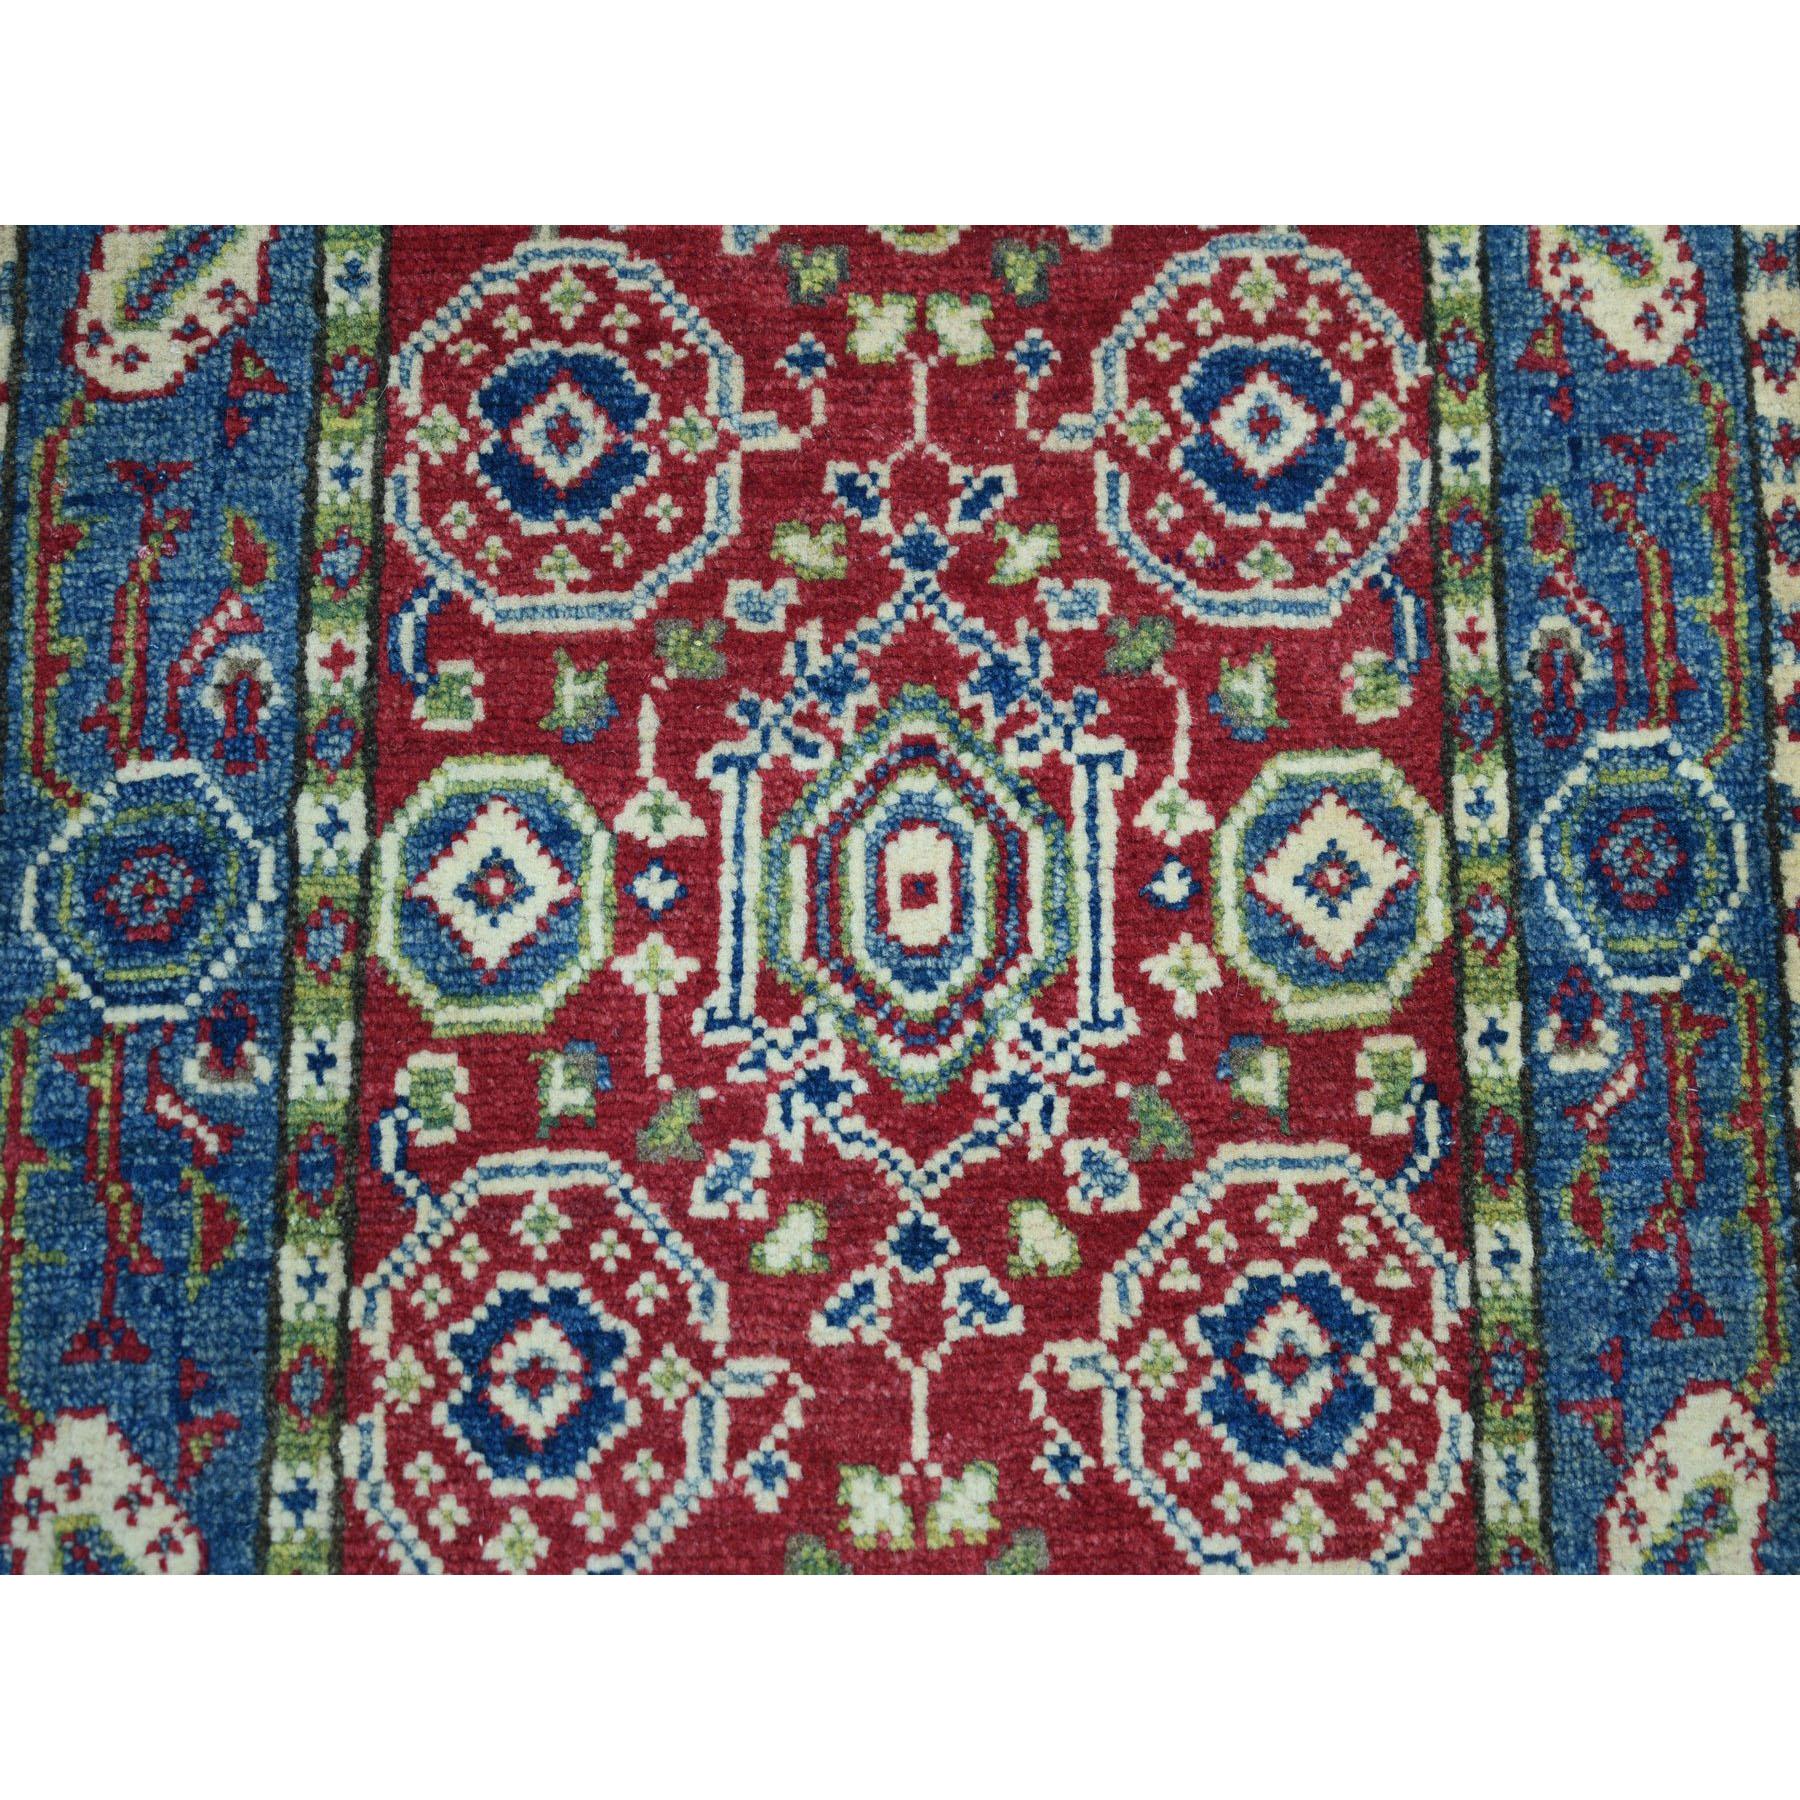 "2'x2'10"" Red Kazak Geometric Design Pure Wool Hand-Knotted Oriental Rug"